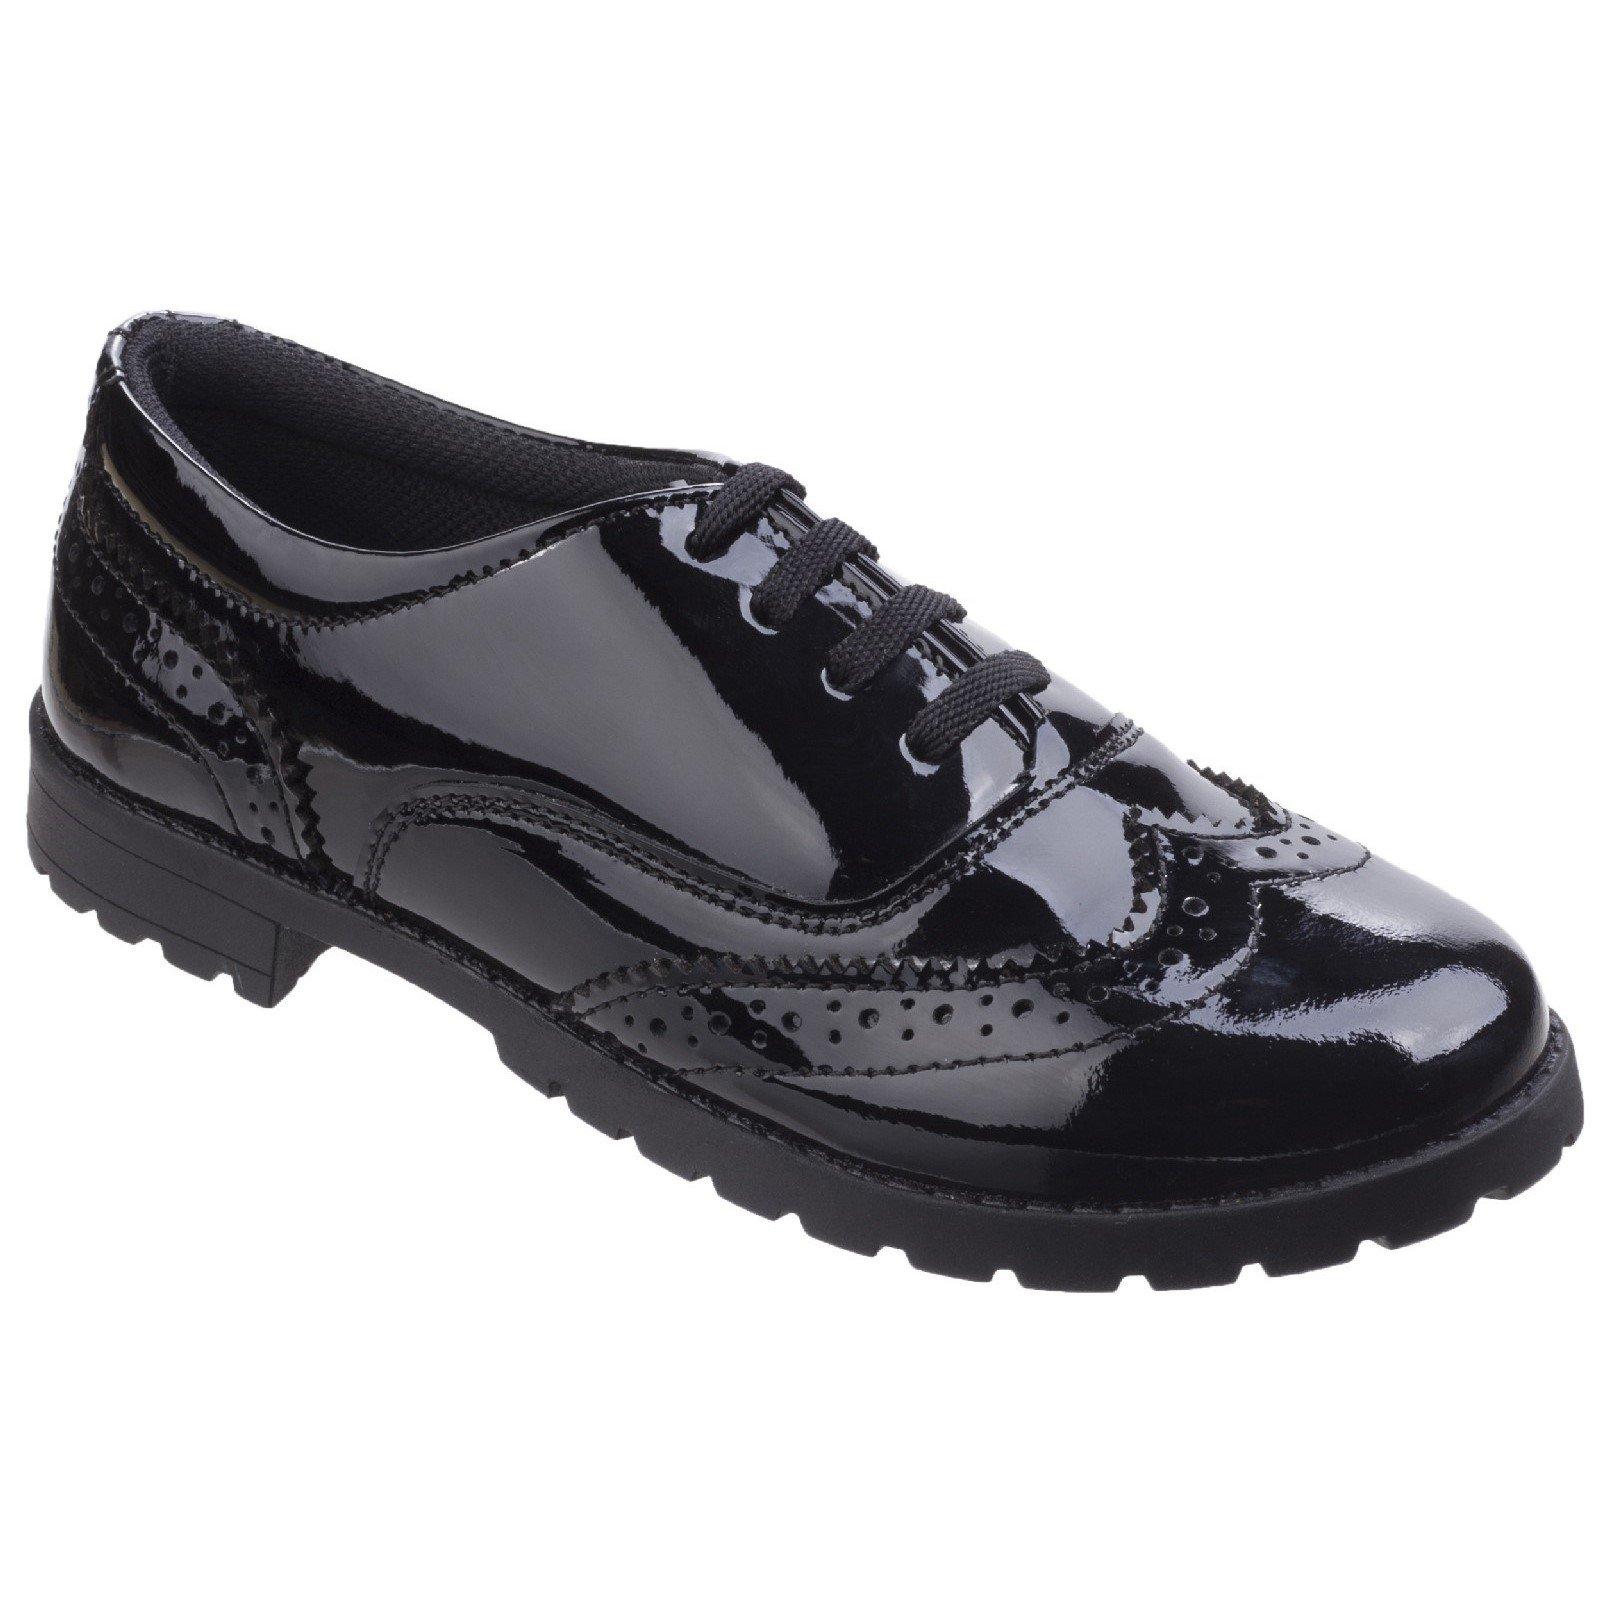 Hush Puppies Kid's Eadie Senior Patent School Shoe Black 32735 - Patent Black 3